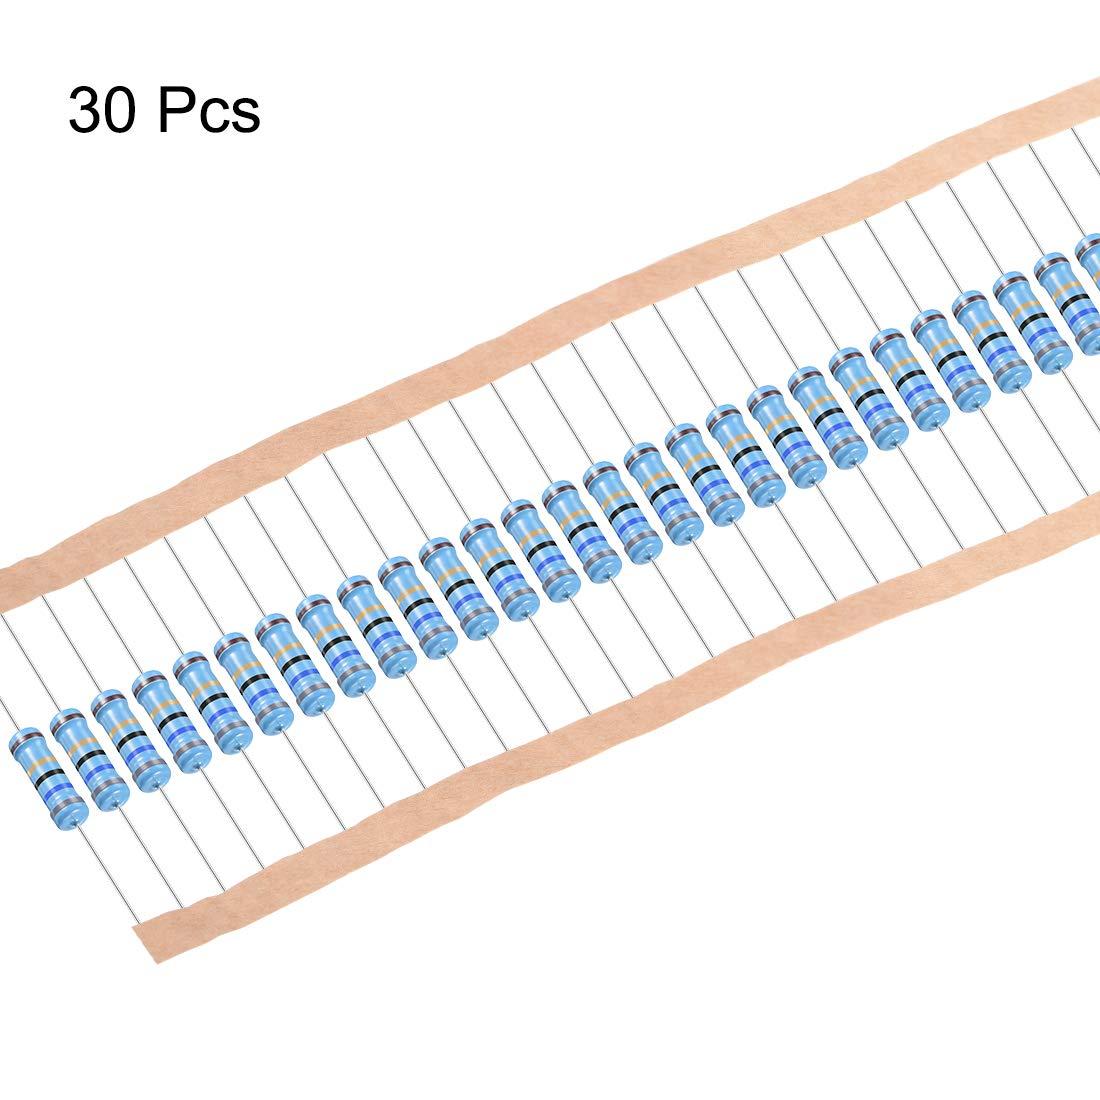 uxcell Metal Film Resistors 6.8 Ohm 1W 1/% Tolerances 5 Color Bands Pack of 30